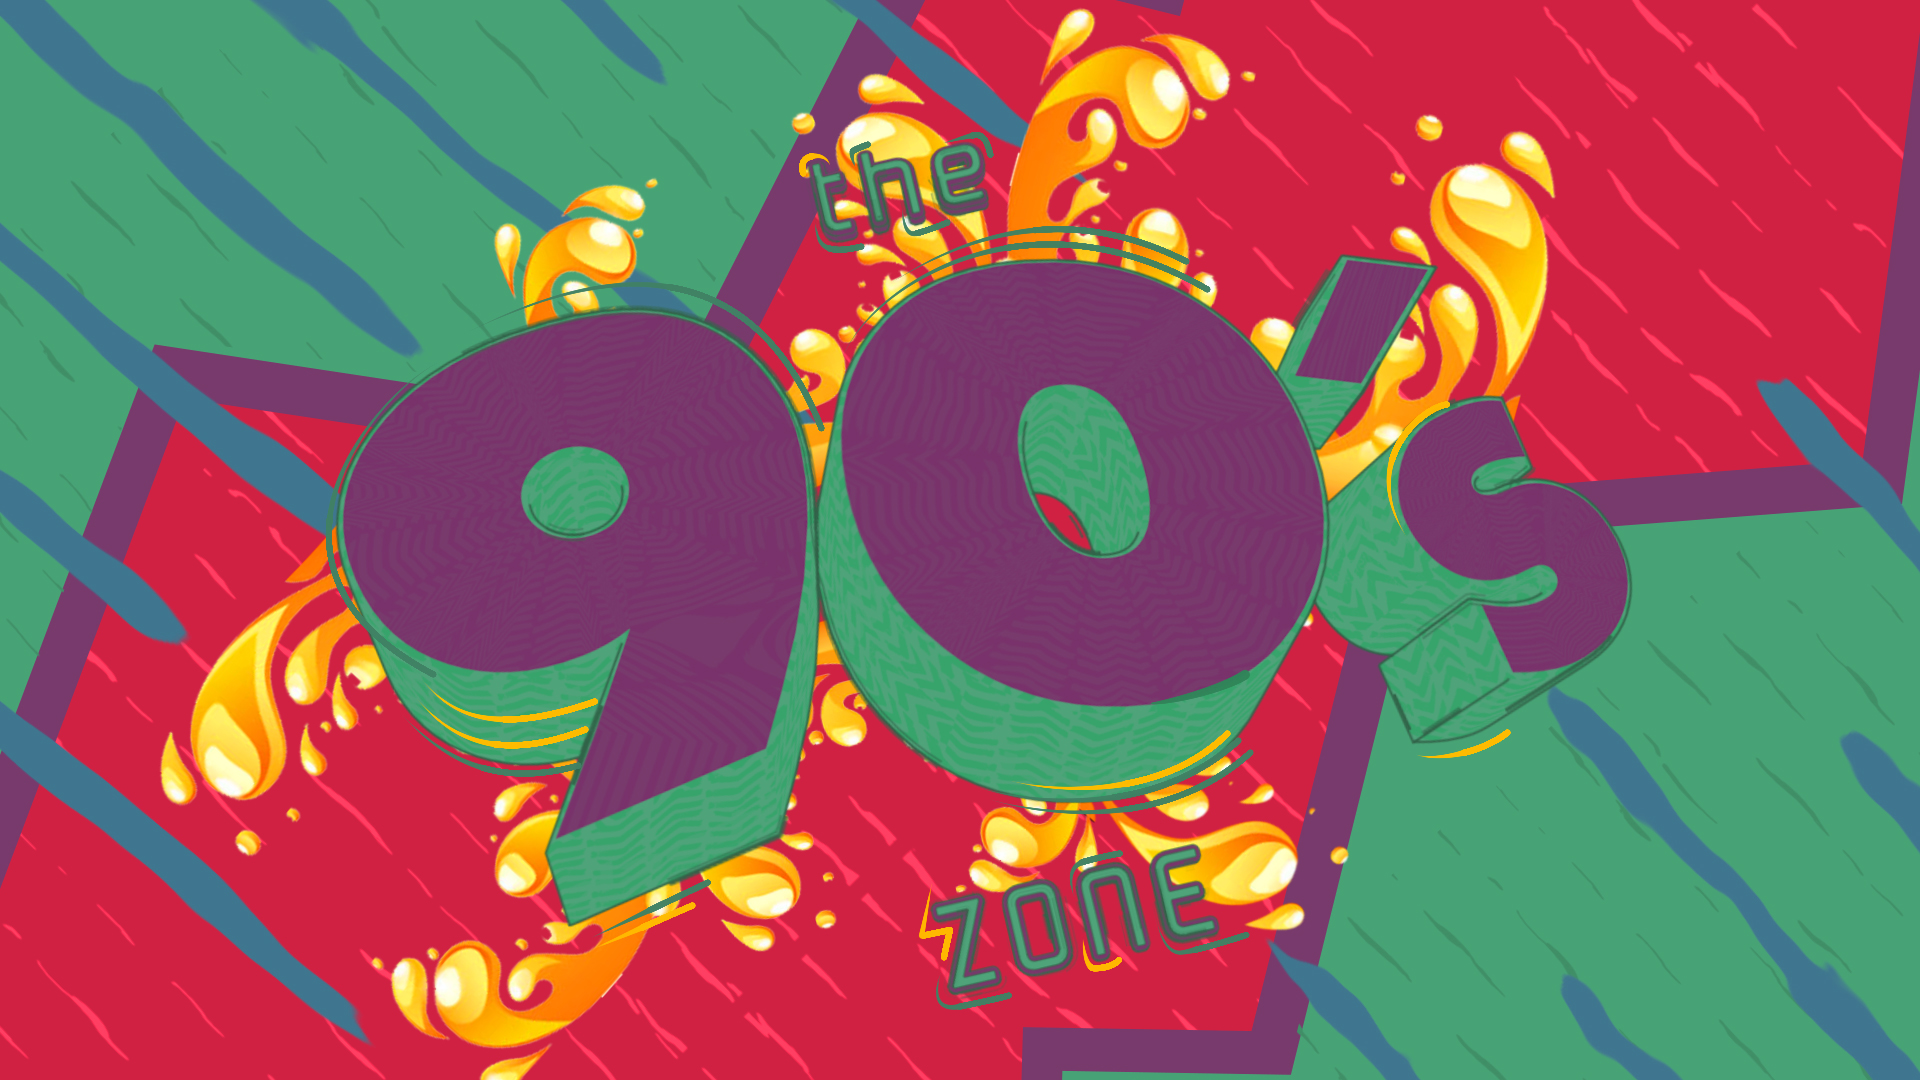 90's_zone_1080.jpg